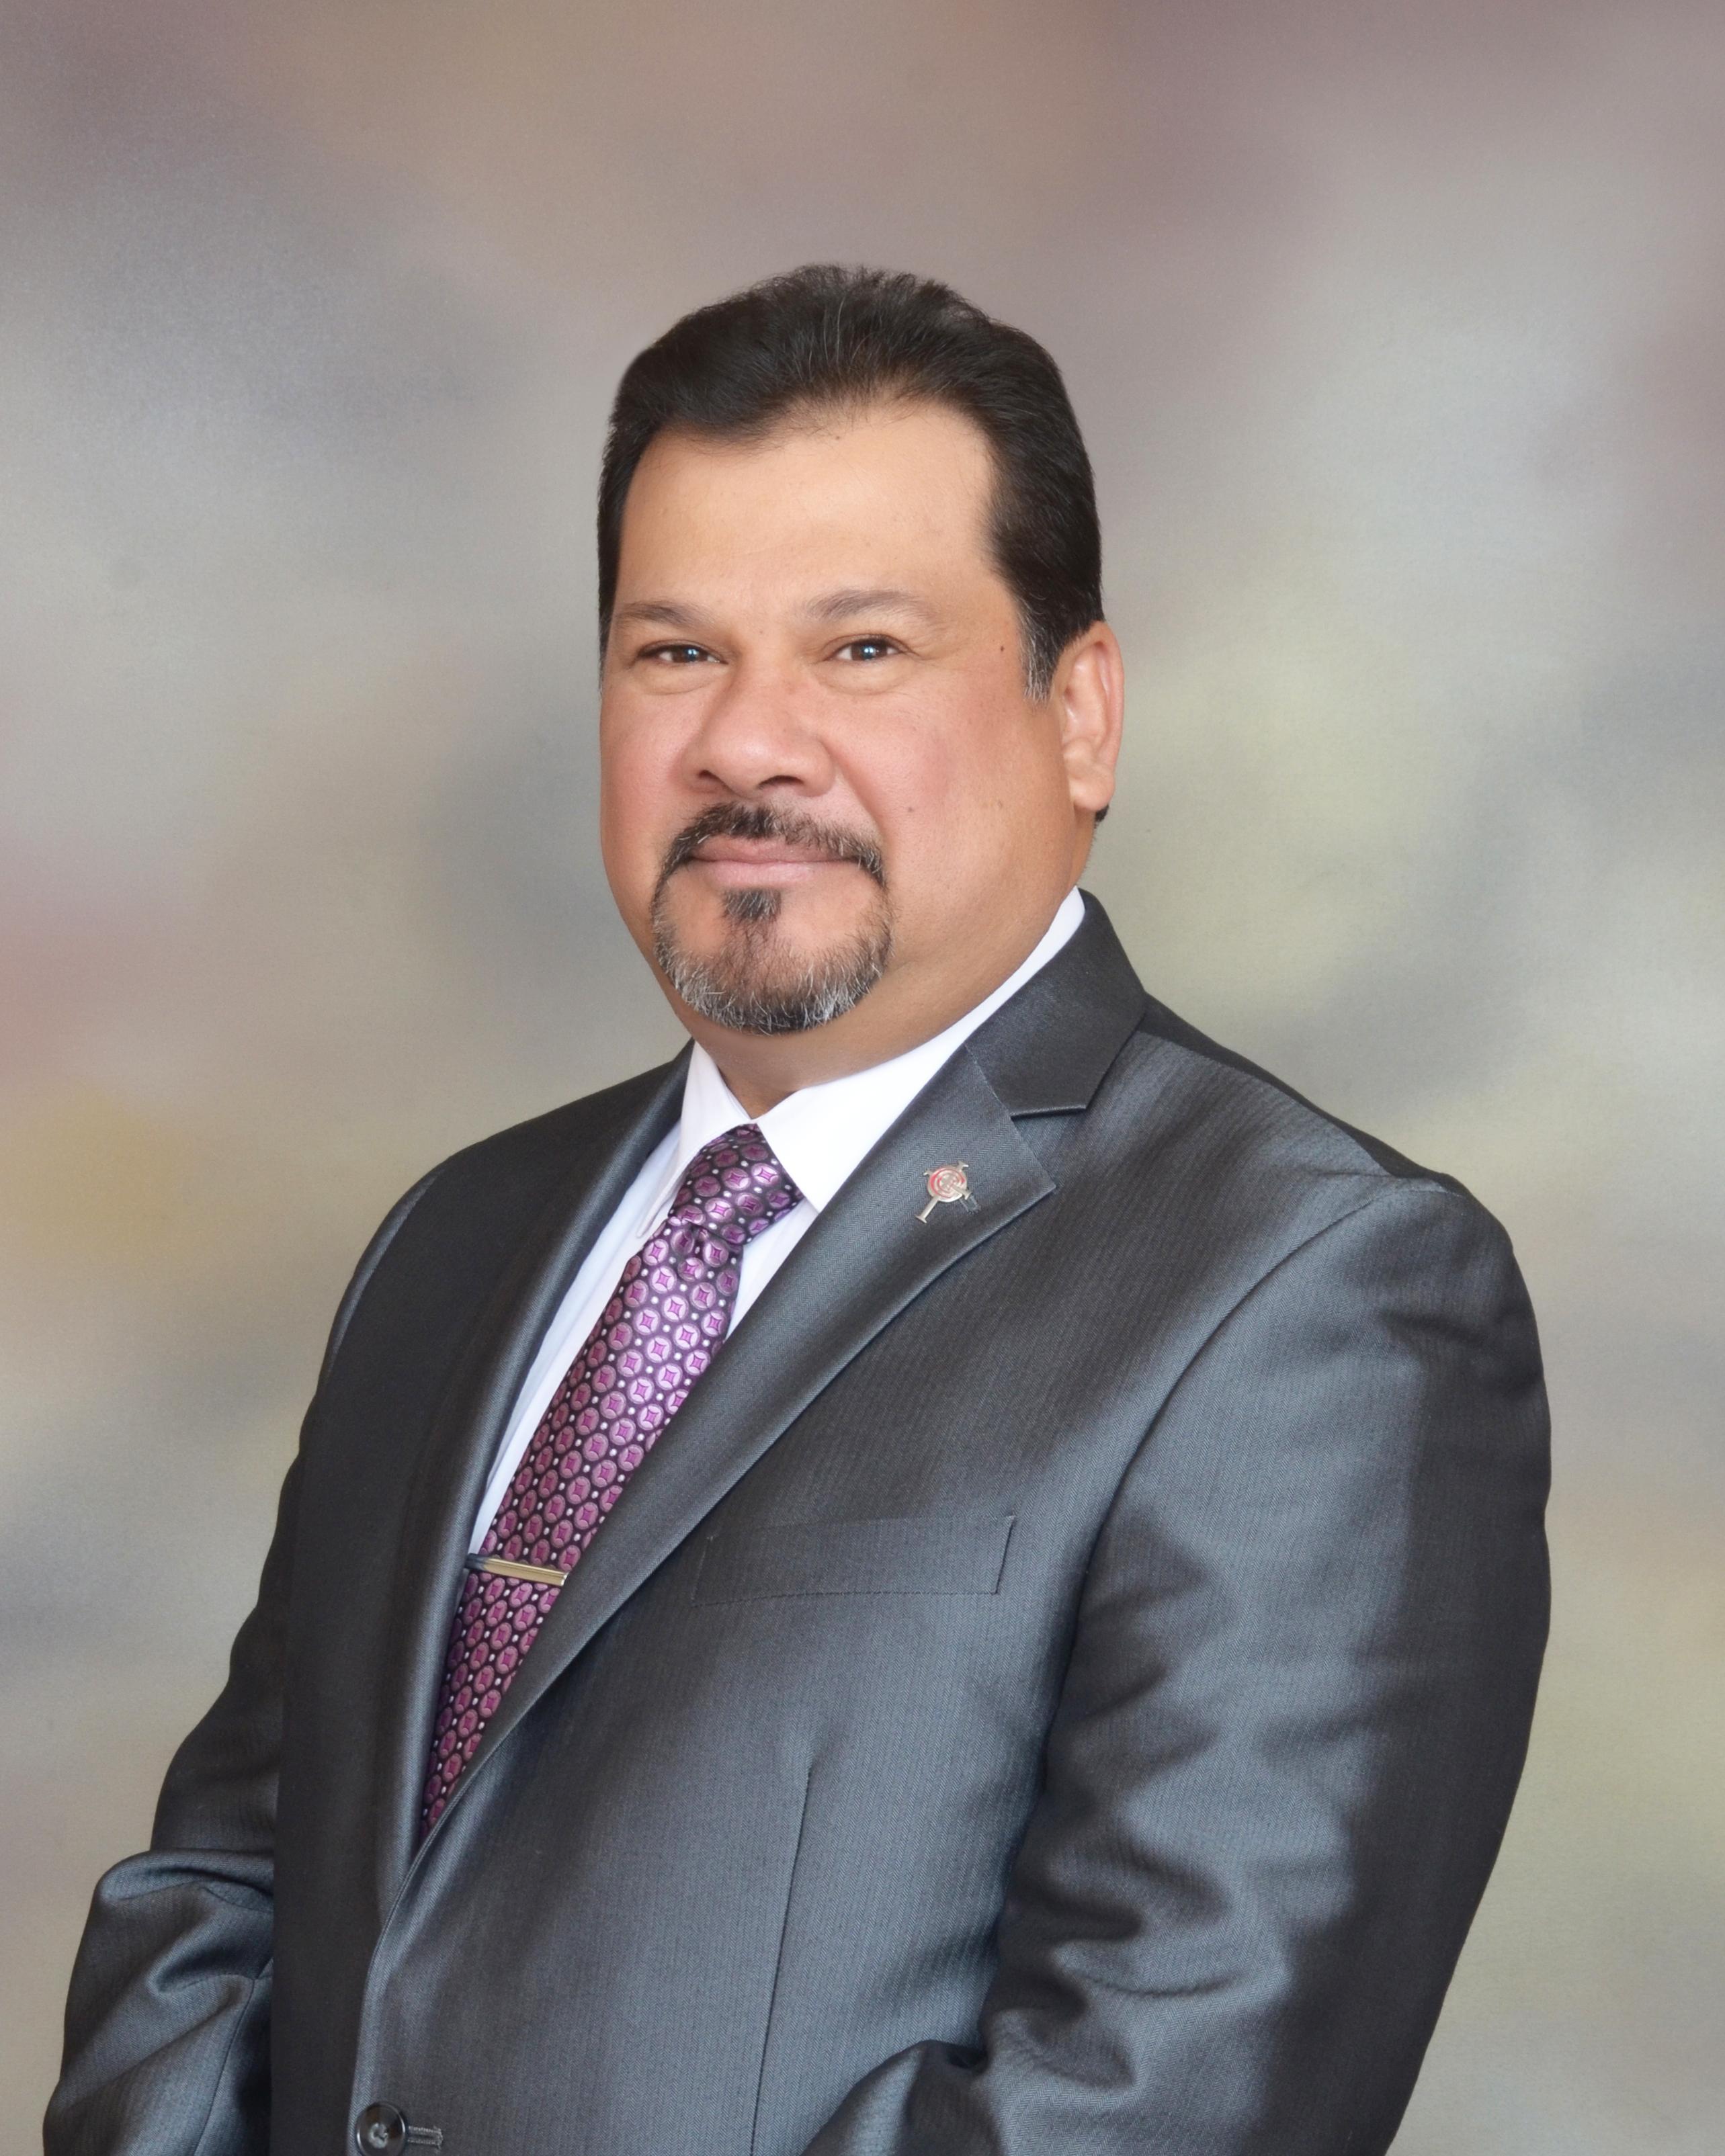 Presbyter Julio Patiño